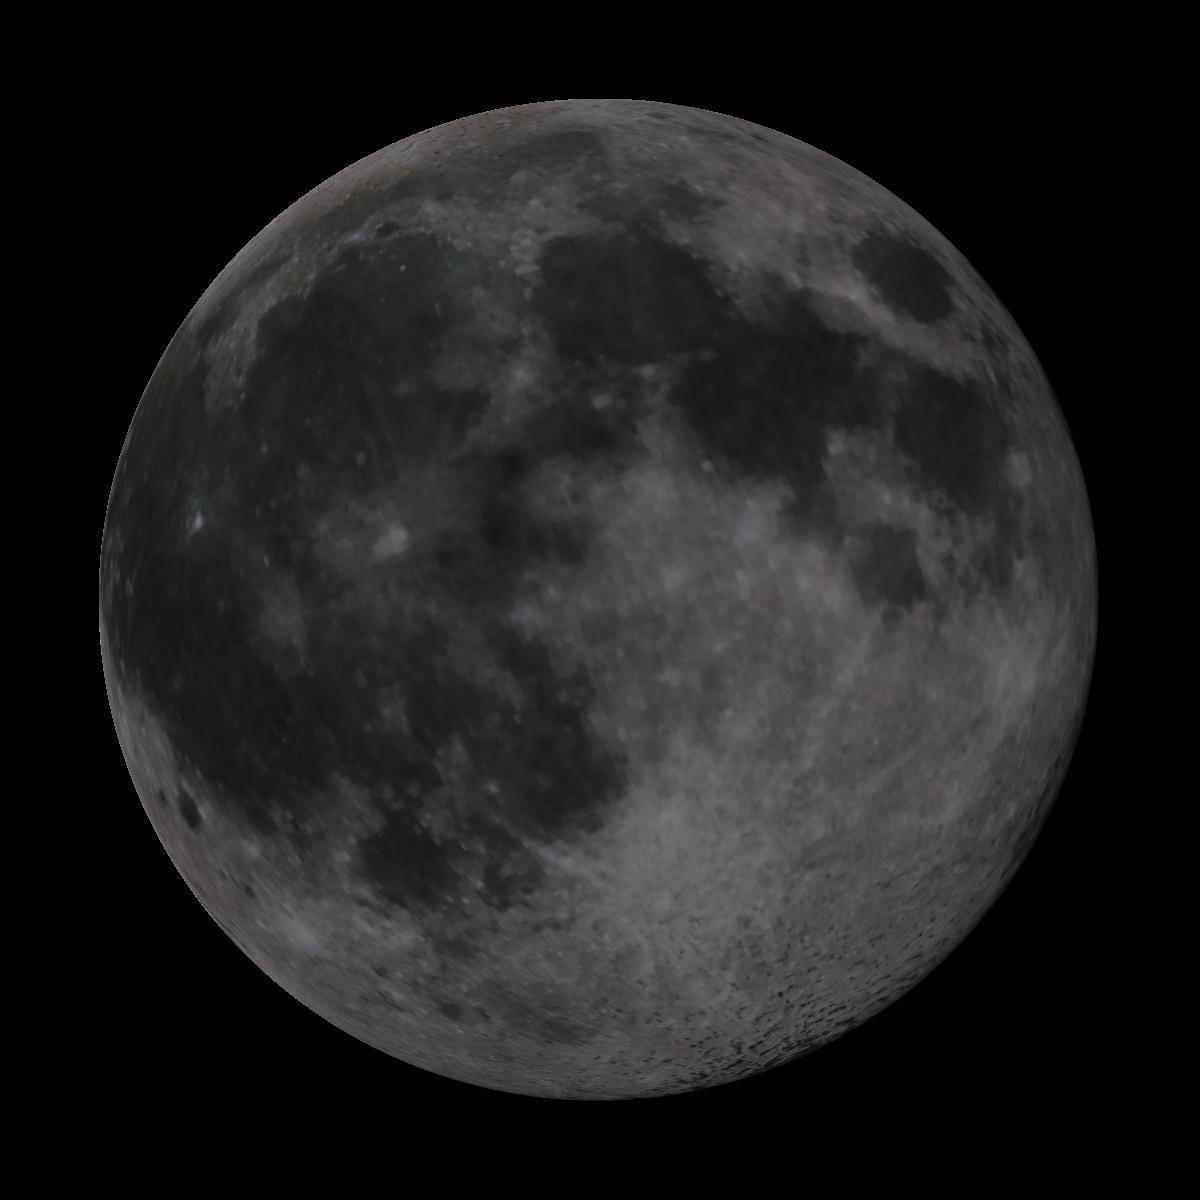 Lune du 10 mars 2020